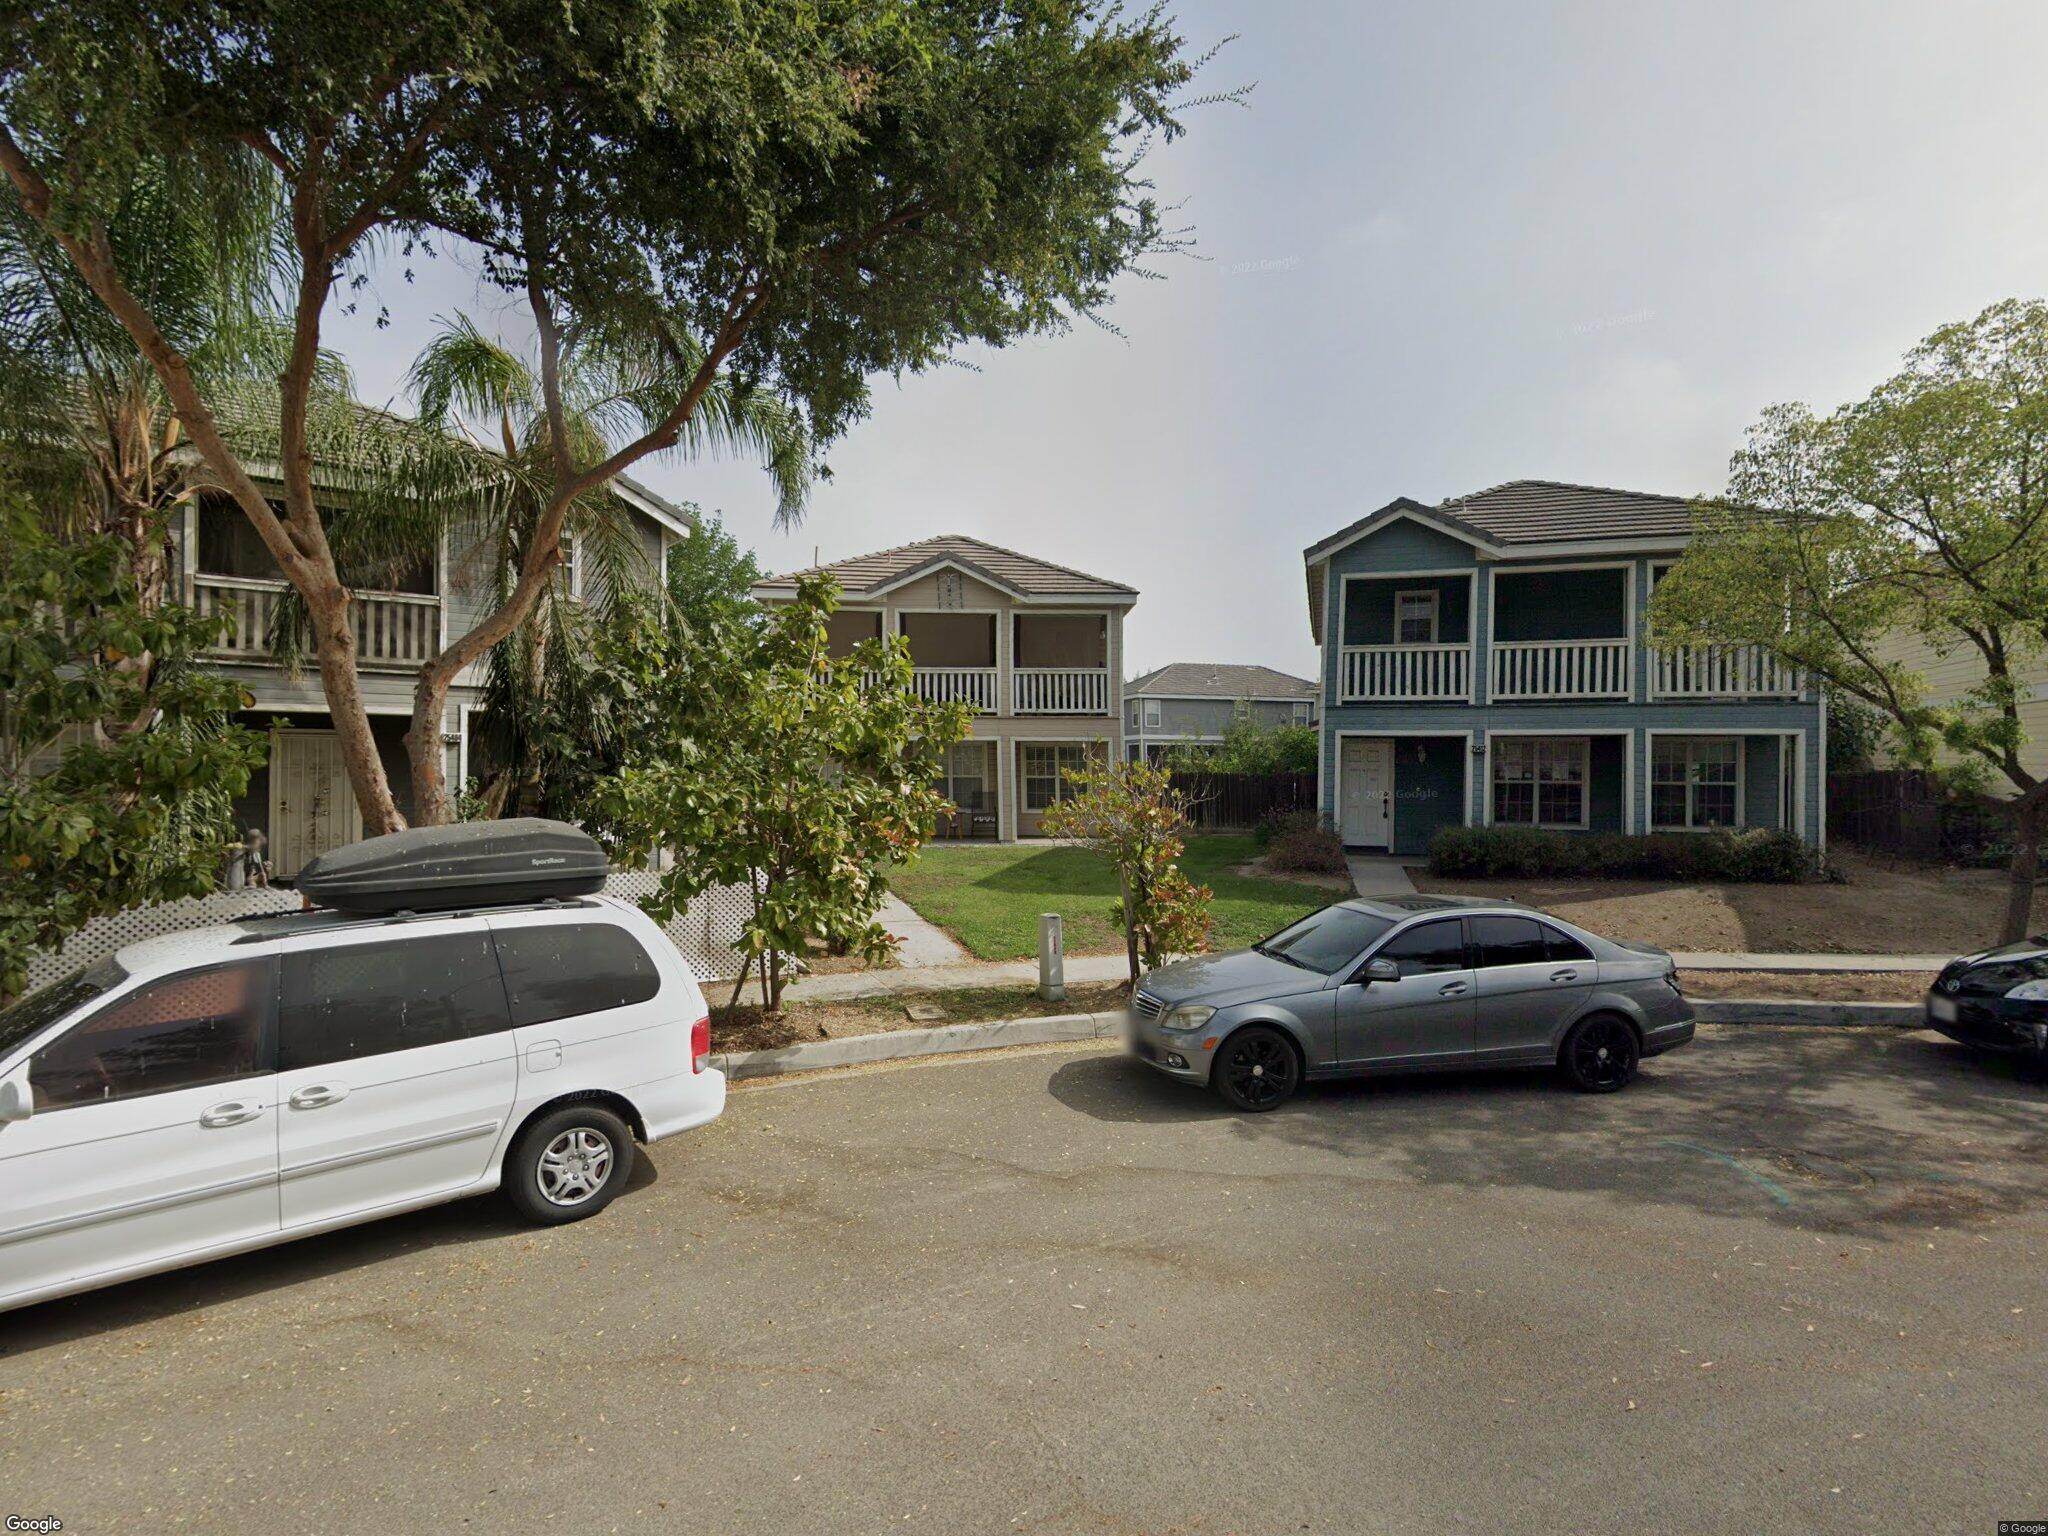 25408 Durango Loop, Loma Linda, CA 92354 - 3 Bed, 2 Bath